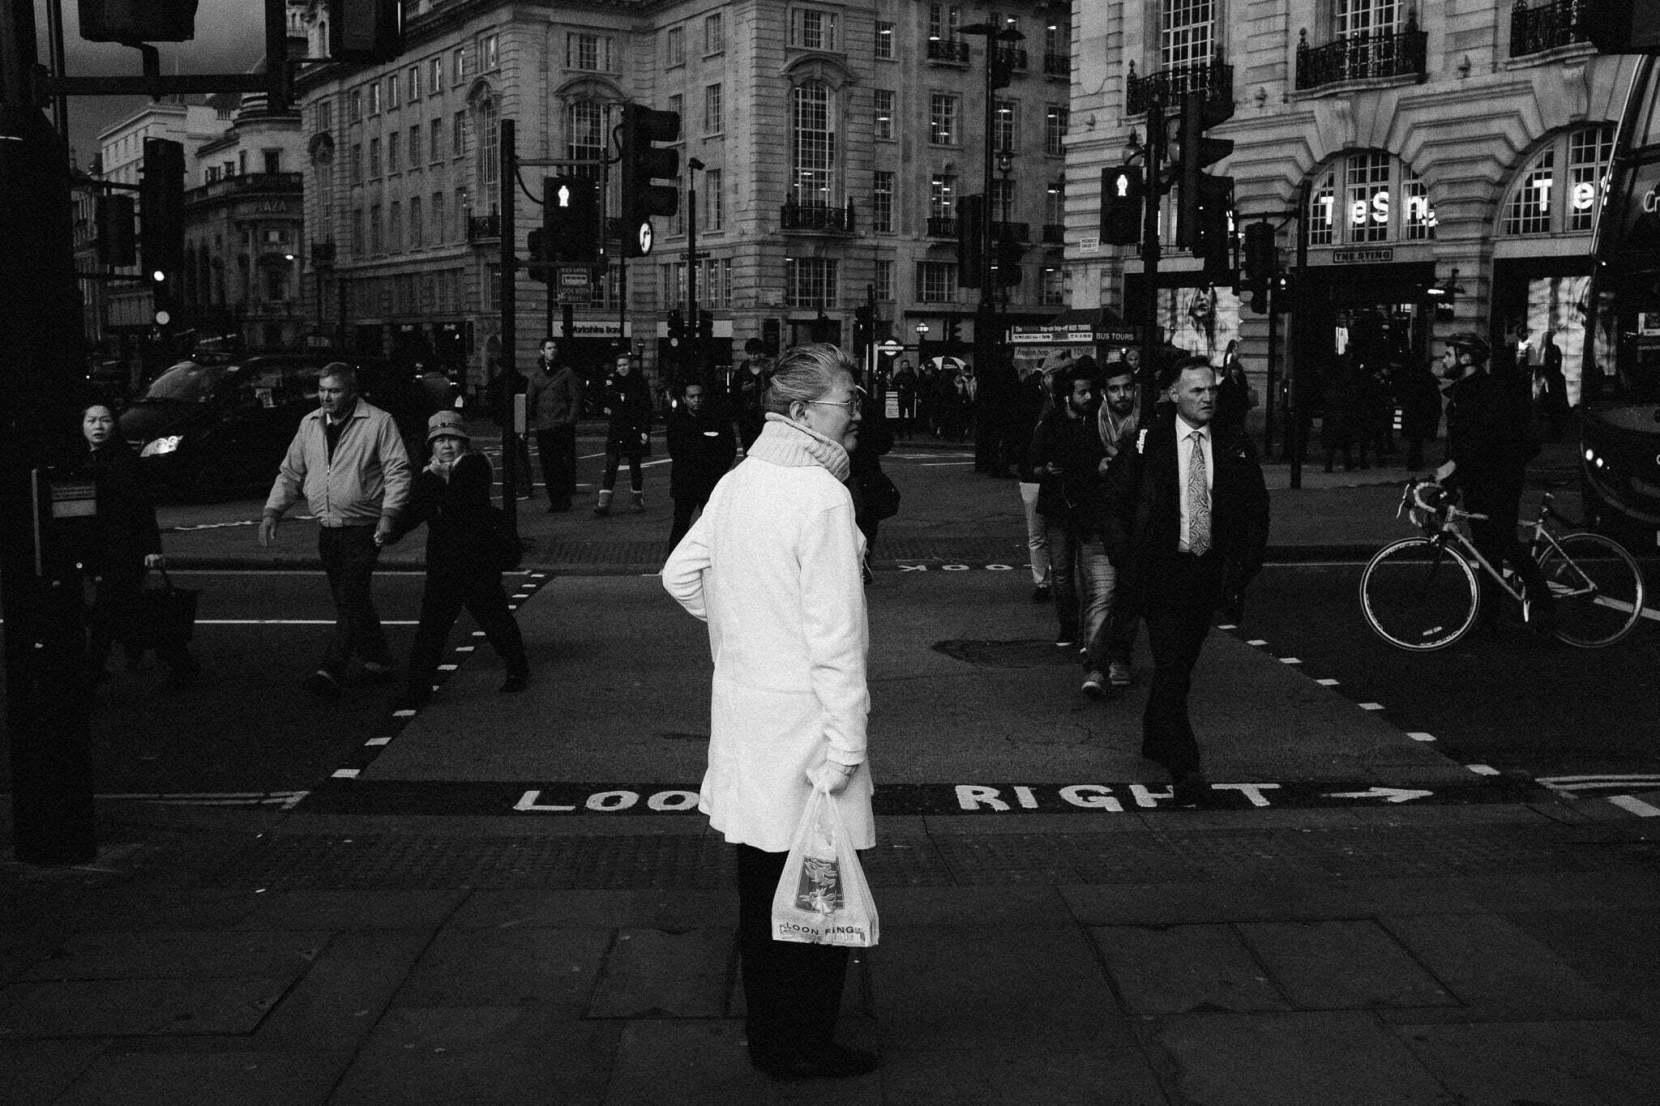 london-street-8094-pete-carr